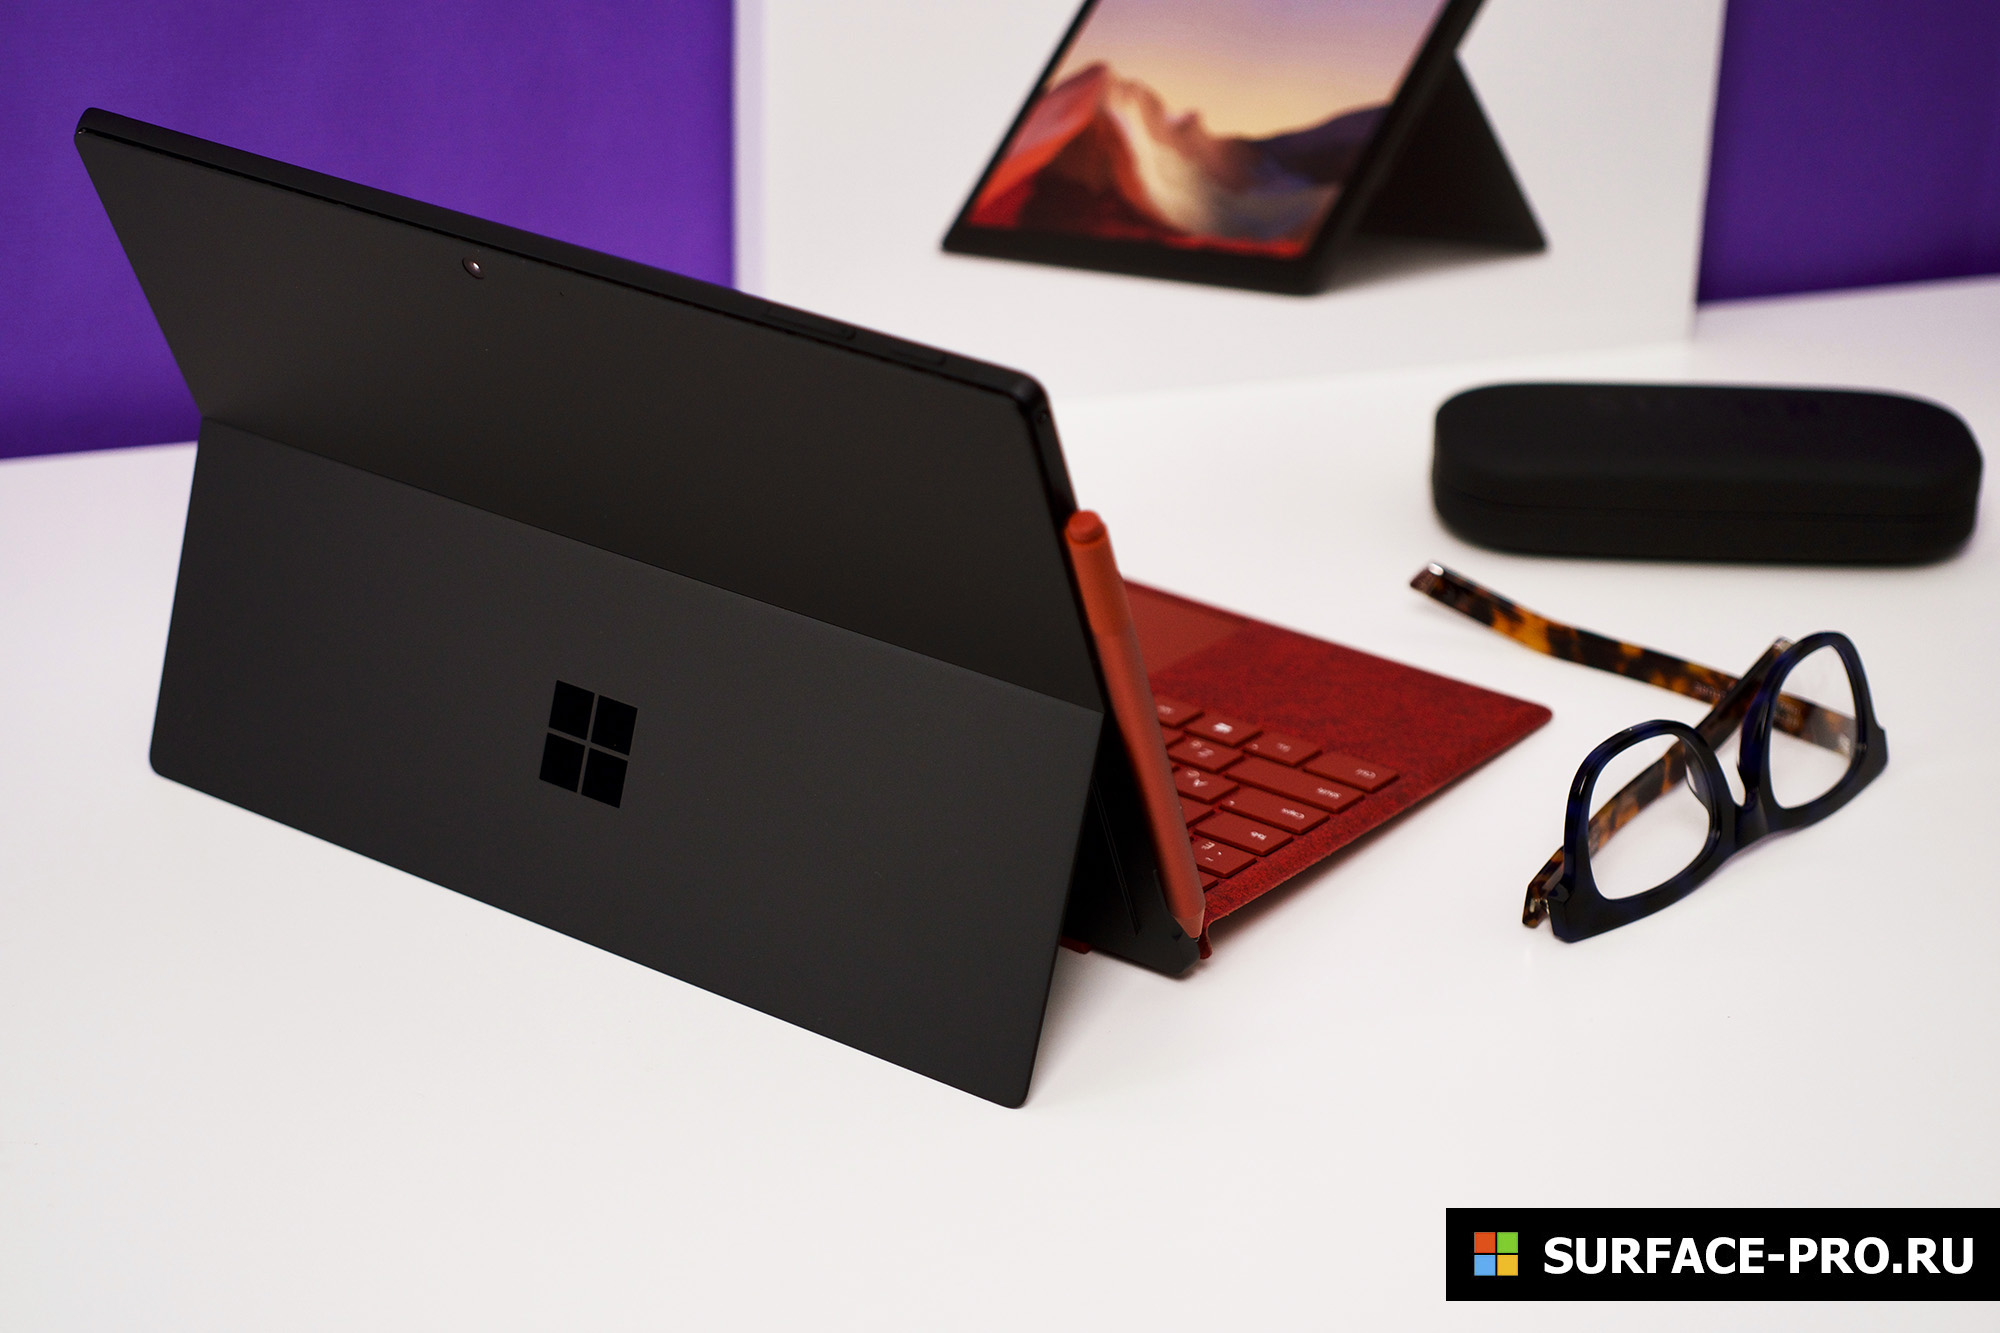 Два планшета и наушники: microsoft представила сразу несколько крутых новинок